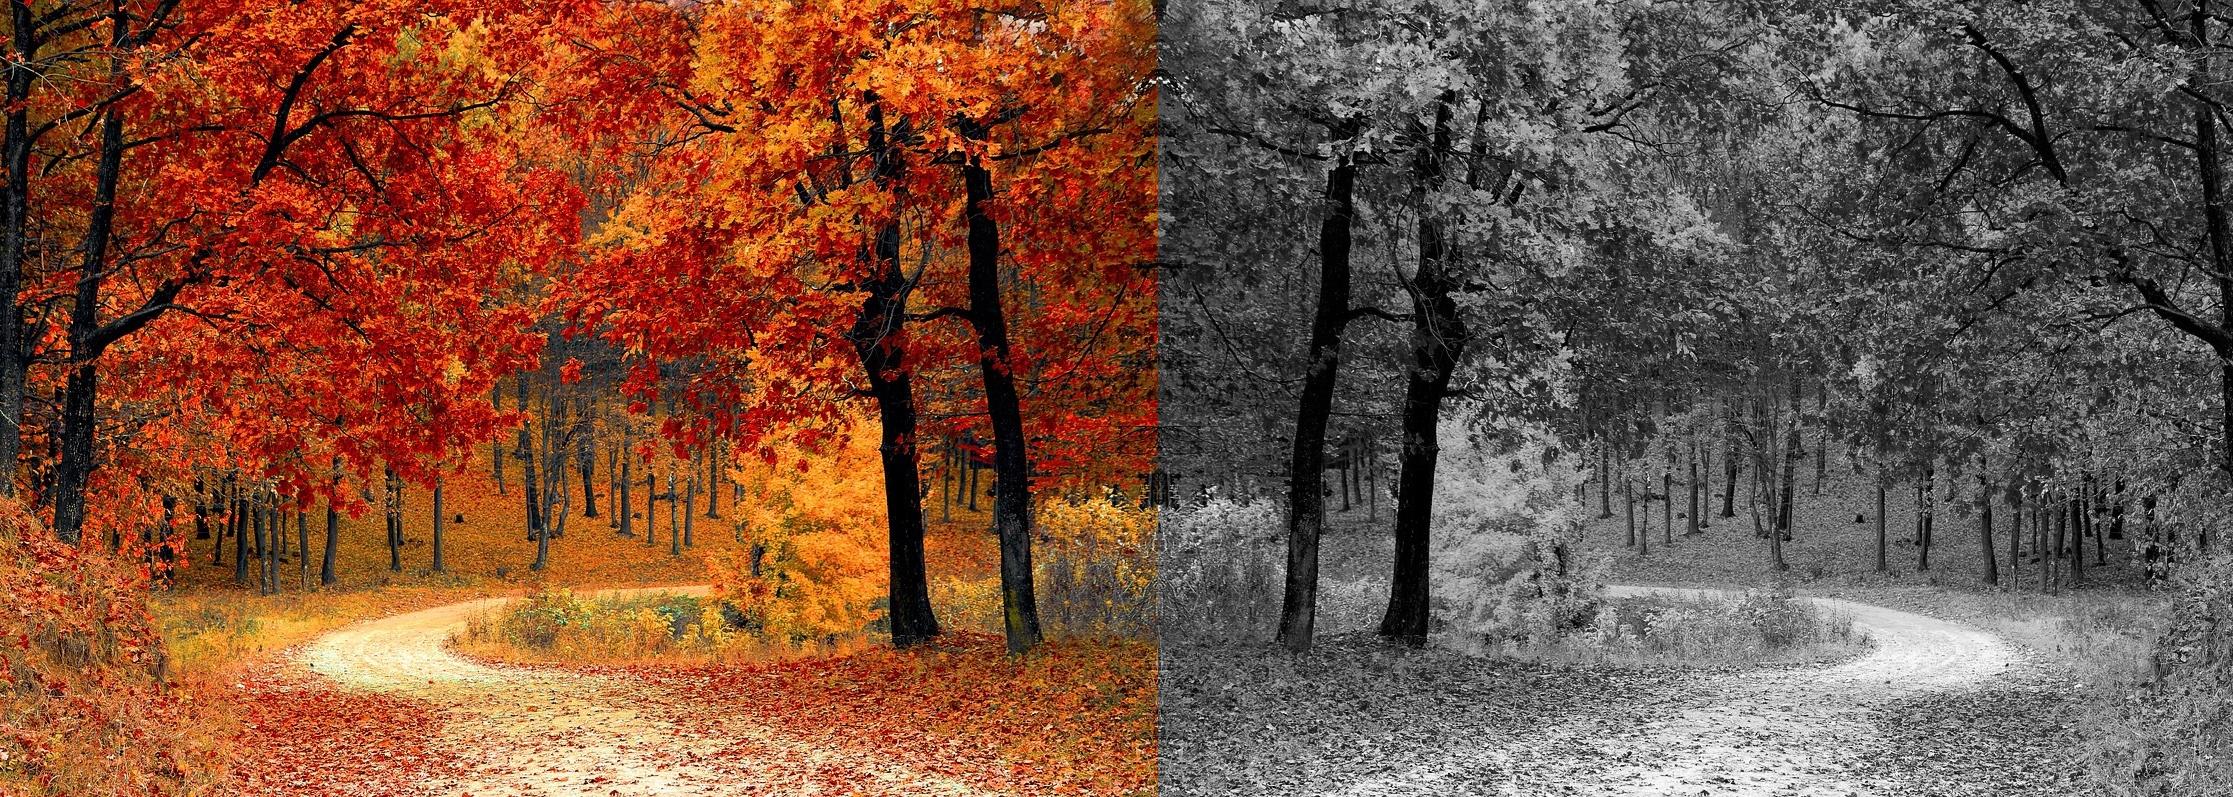 Herbst_Spiegelweg2.jpg